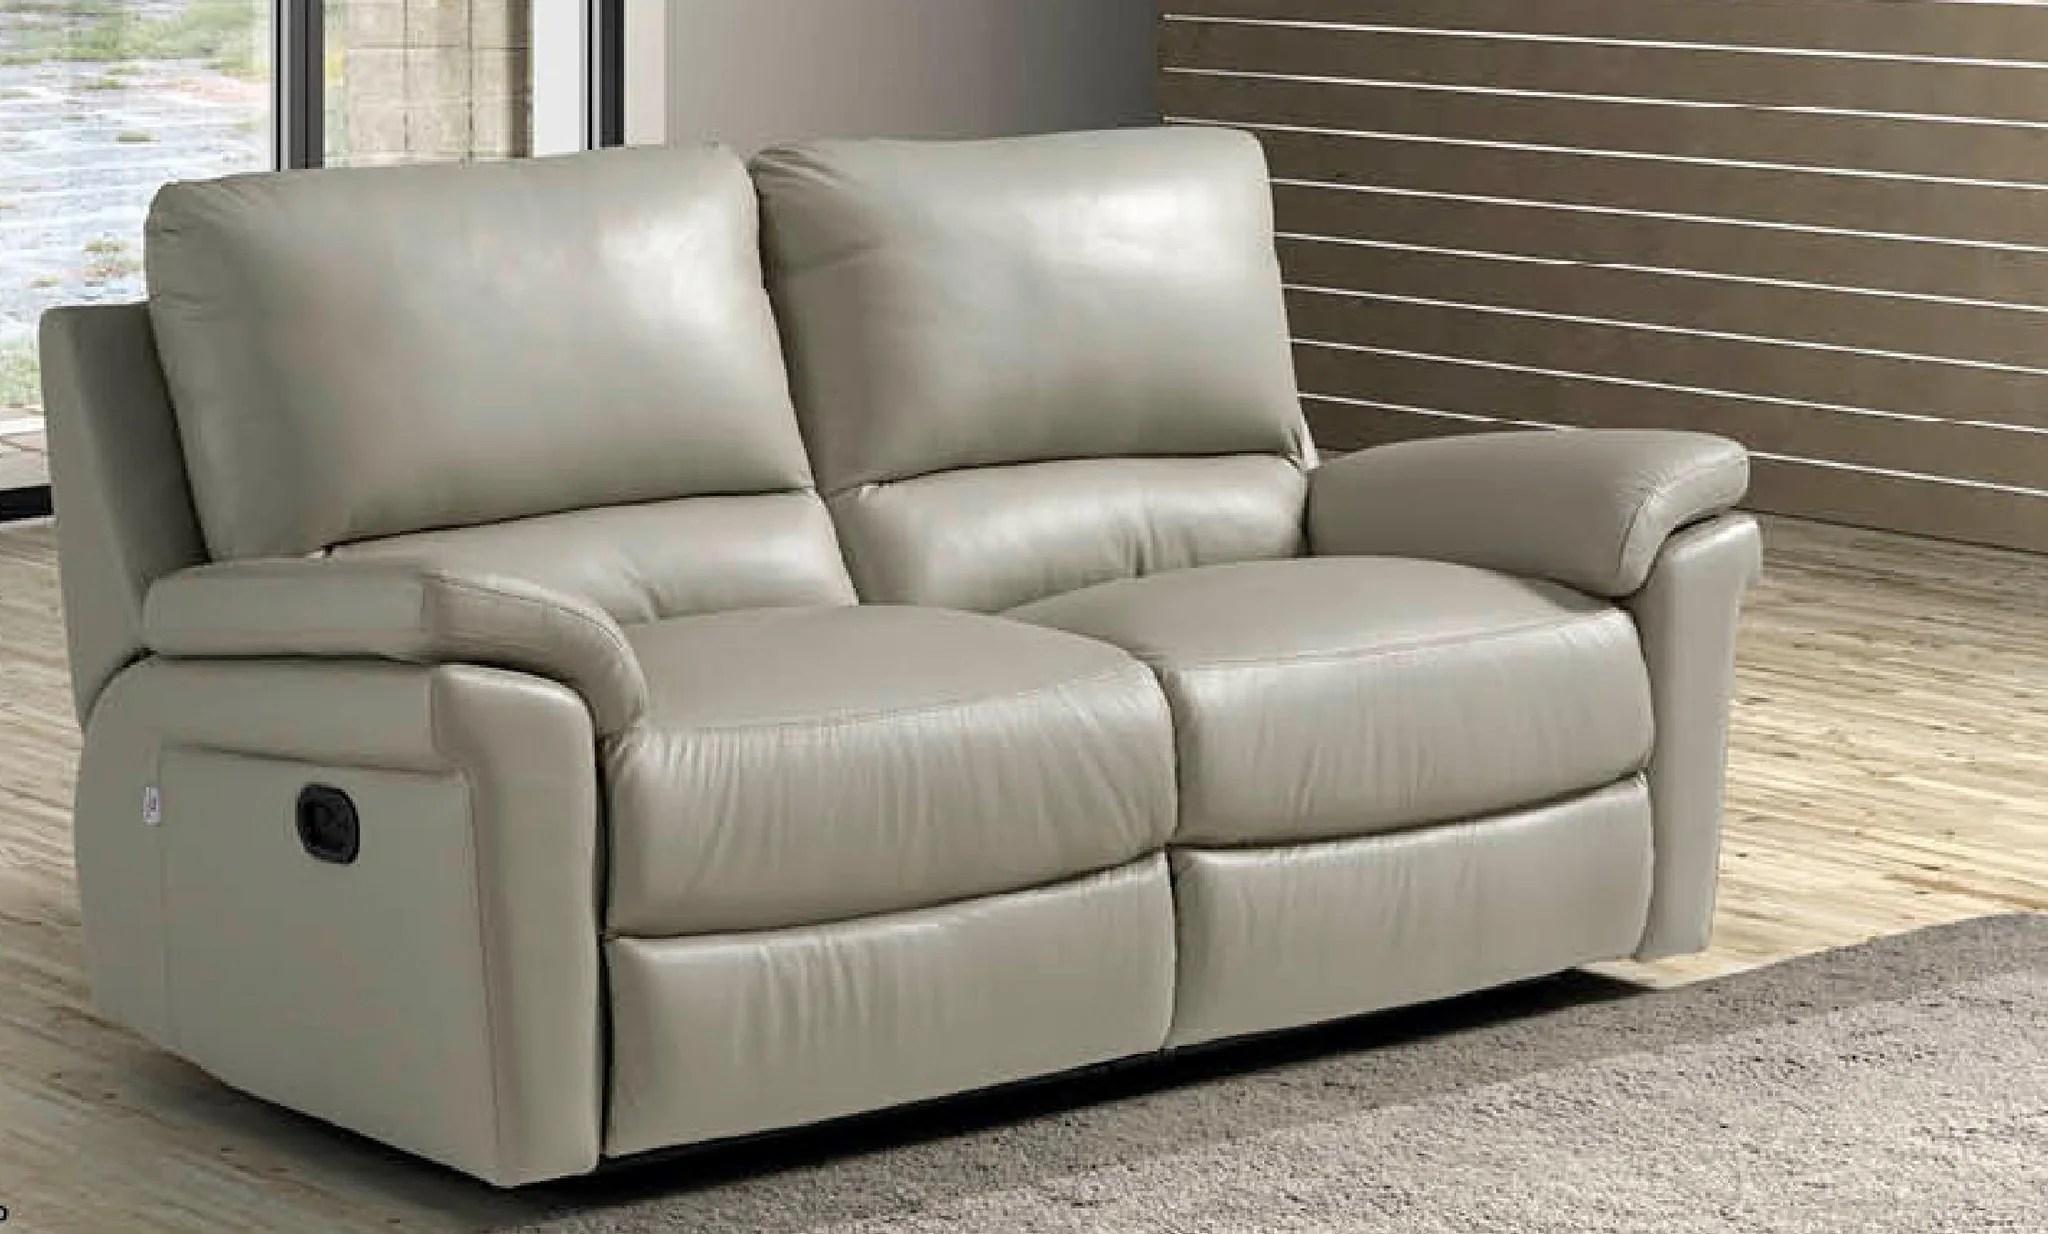 cheap italian leather sofas uk schnadig furniture sofa kc in mansfield